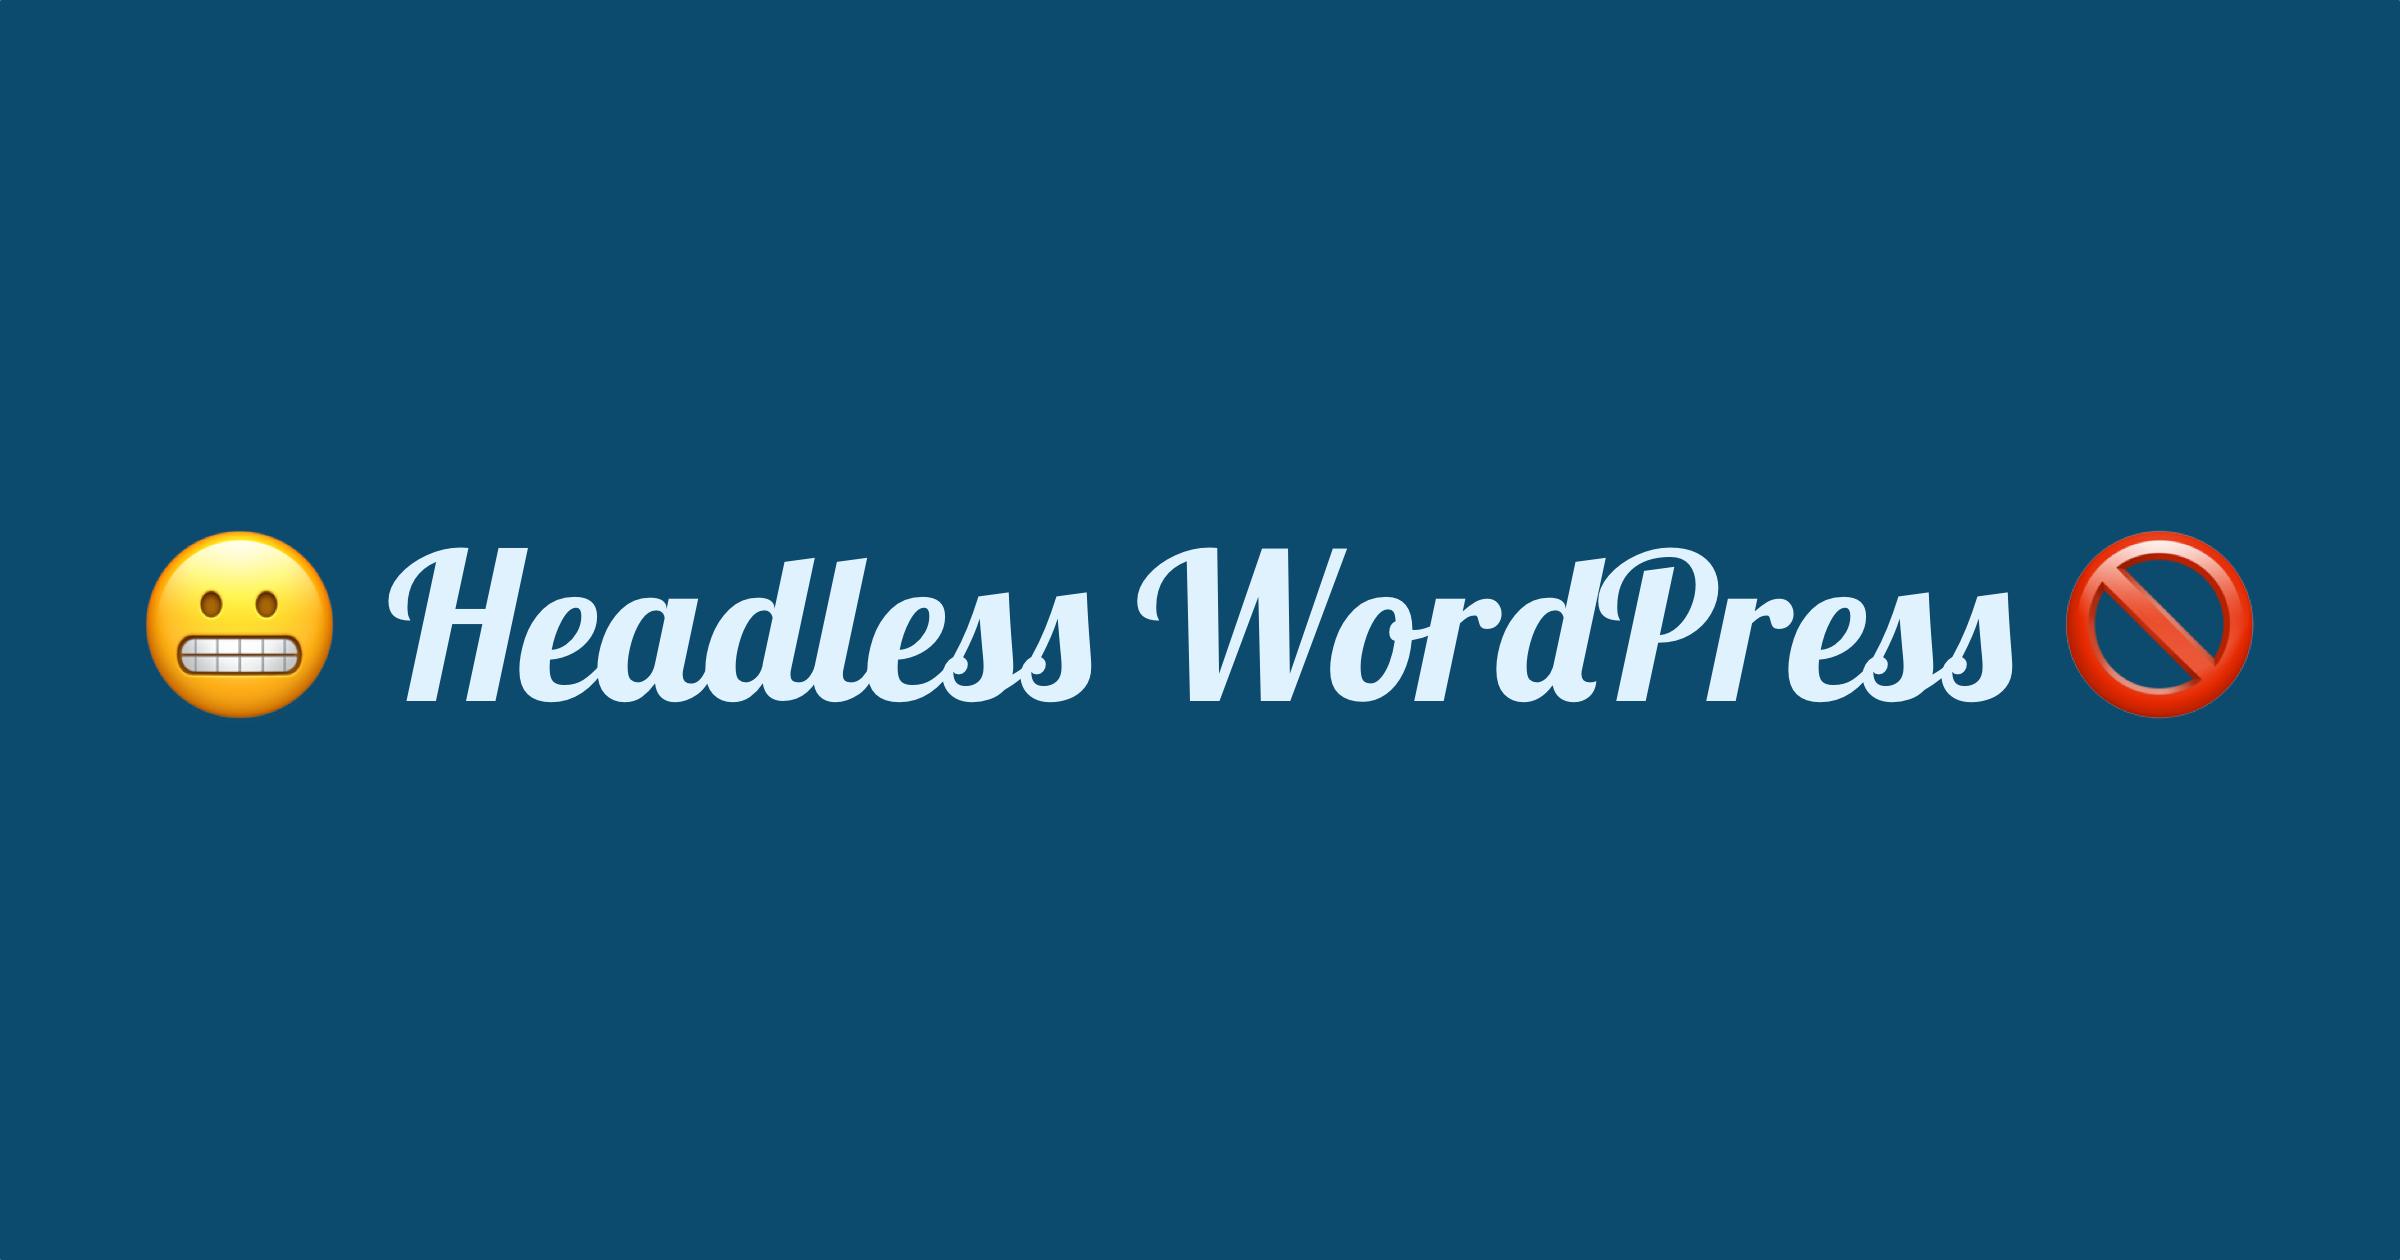 Headless WordPress omslagsbild